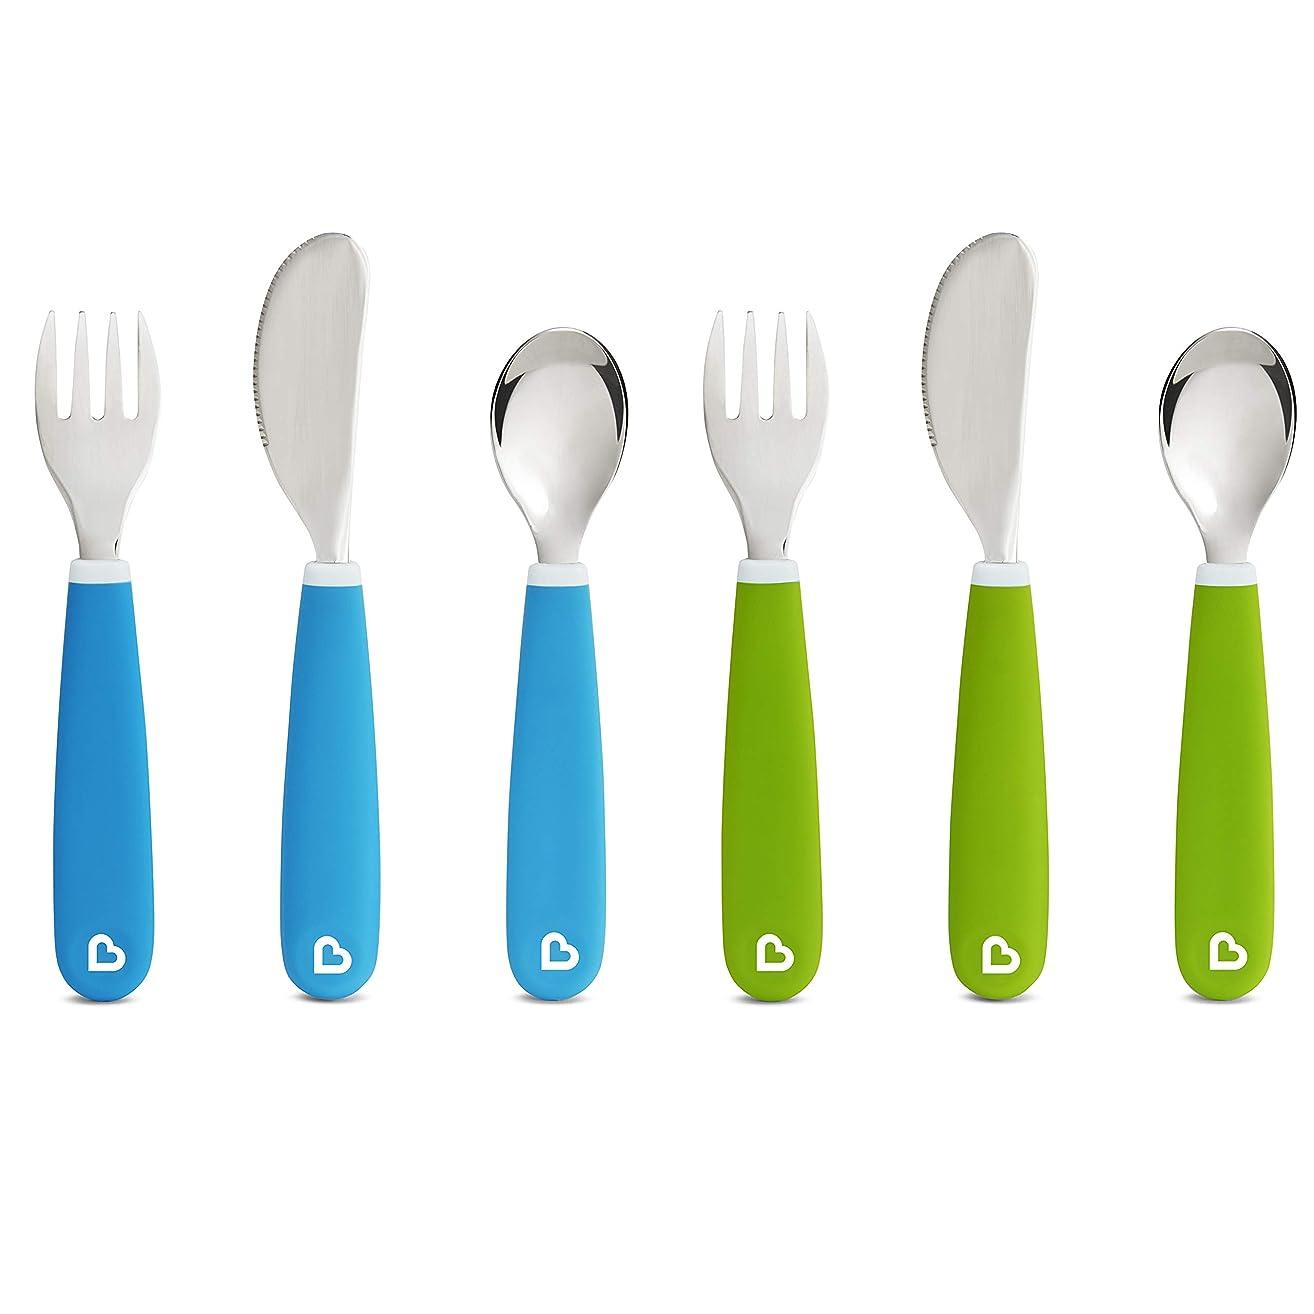 Munchkin Splash Toddler Fork, Knife and Spoon Set, 6 Pack, Blue/Green